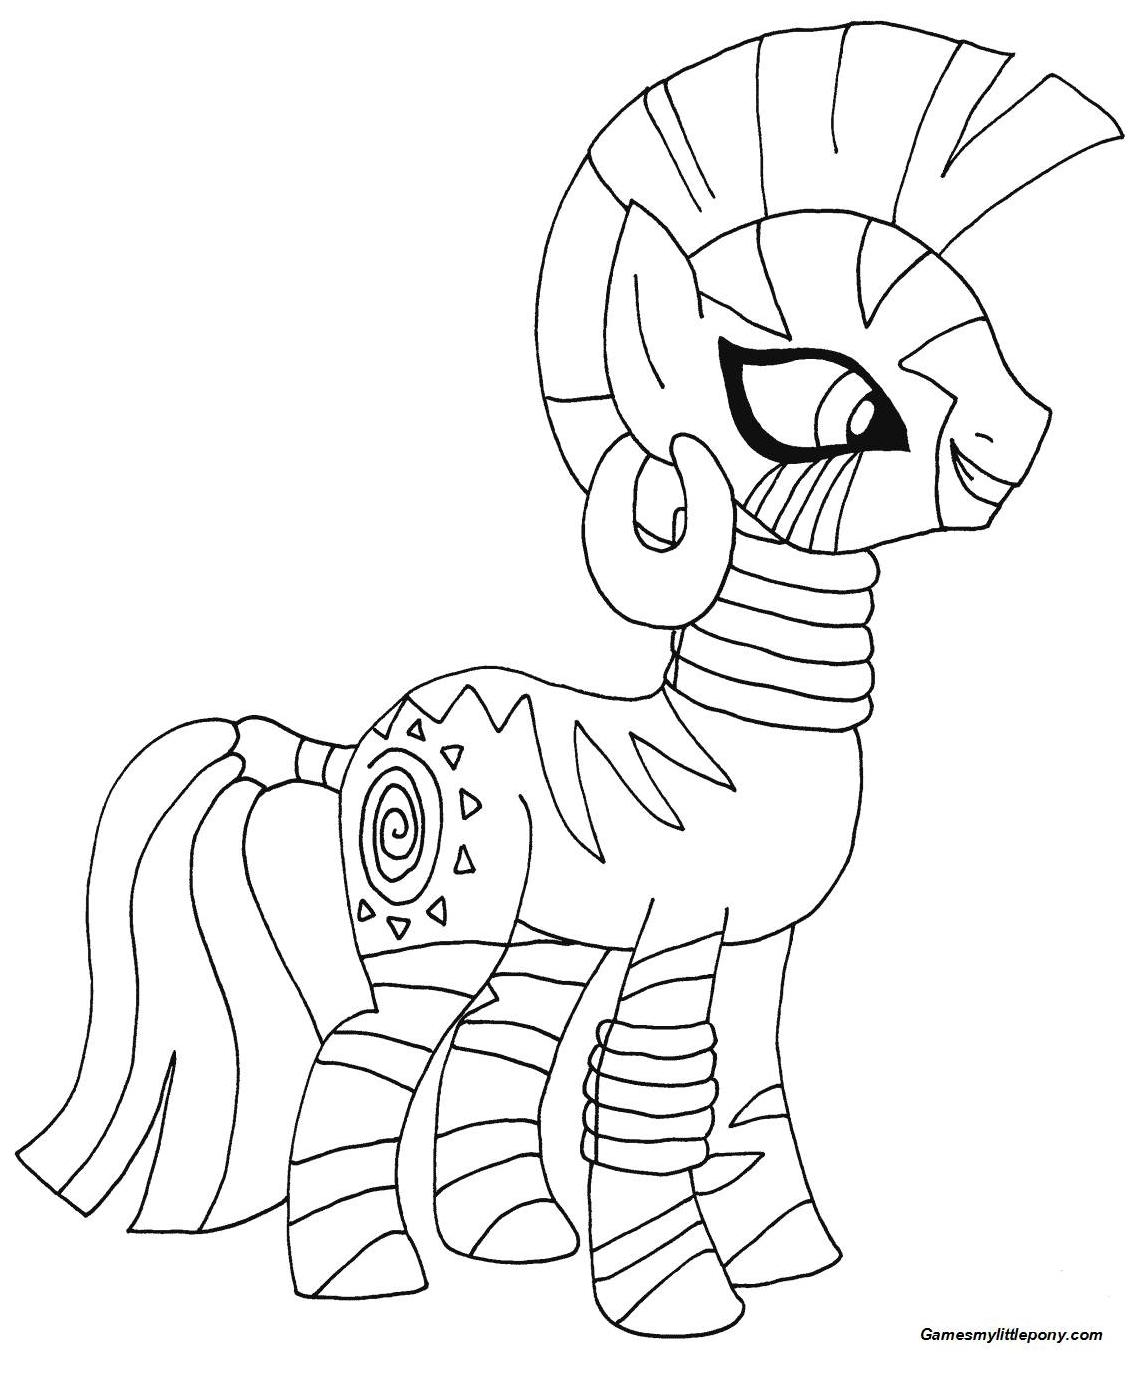 My Little Pony Zecora from My Little Pony